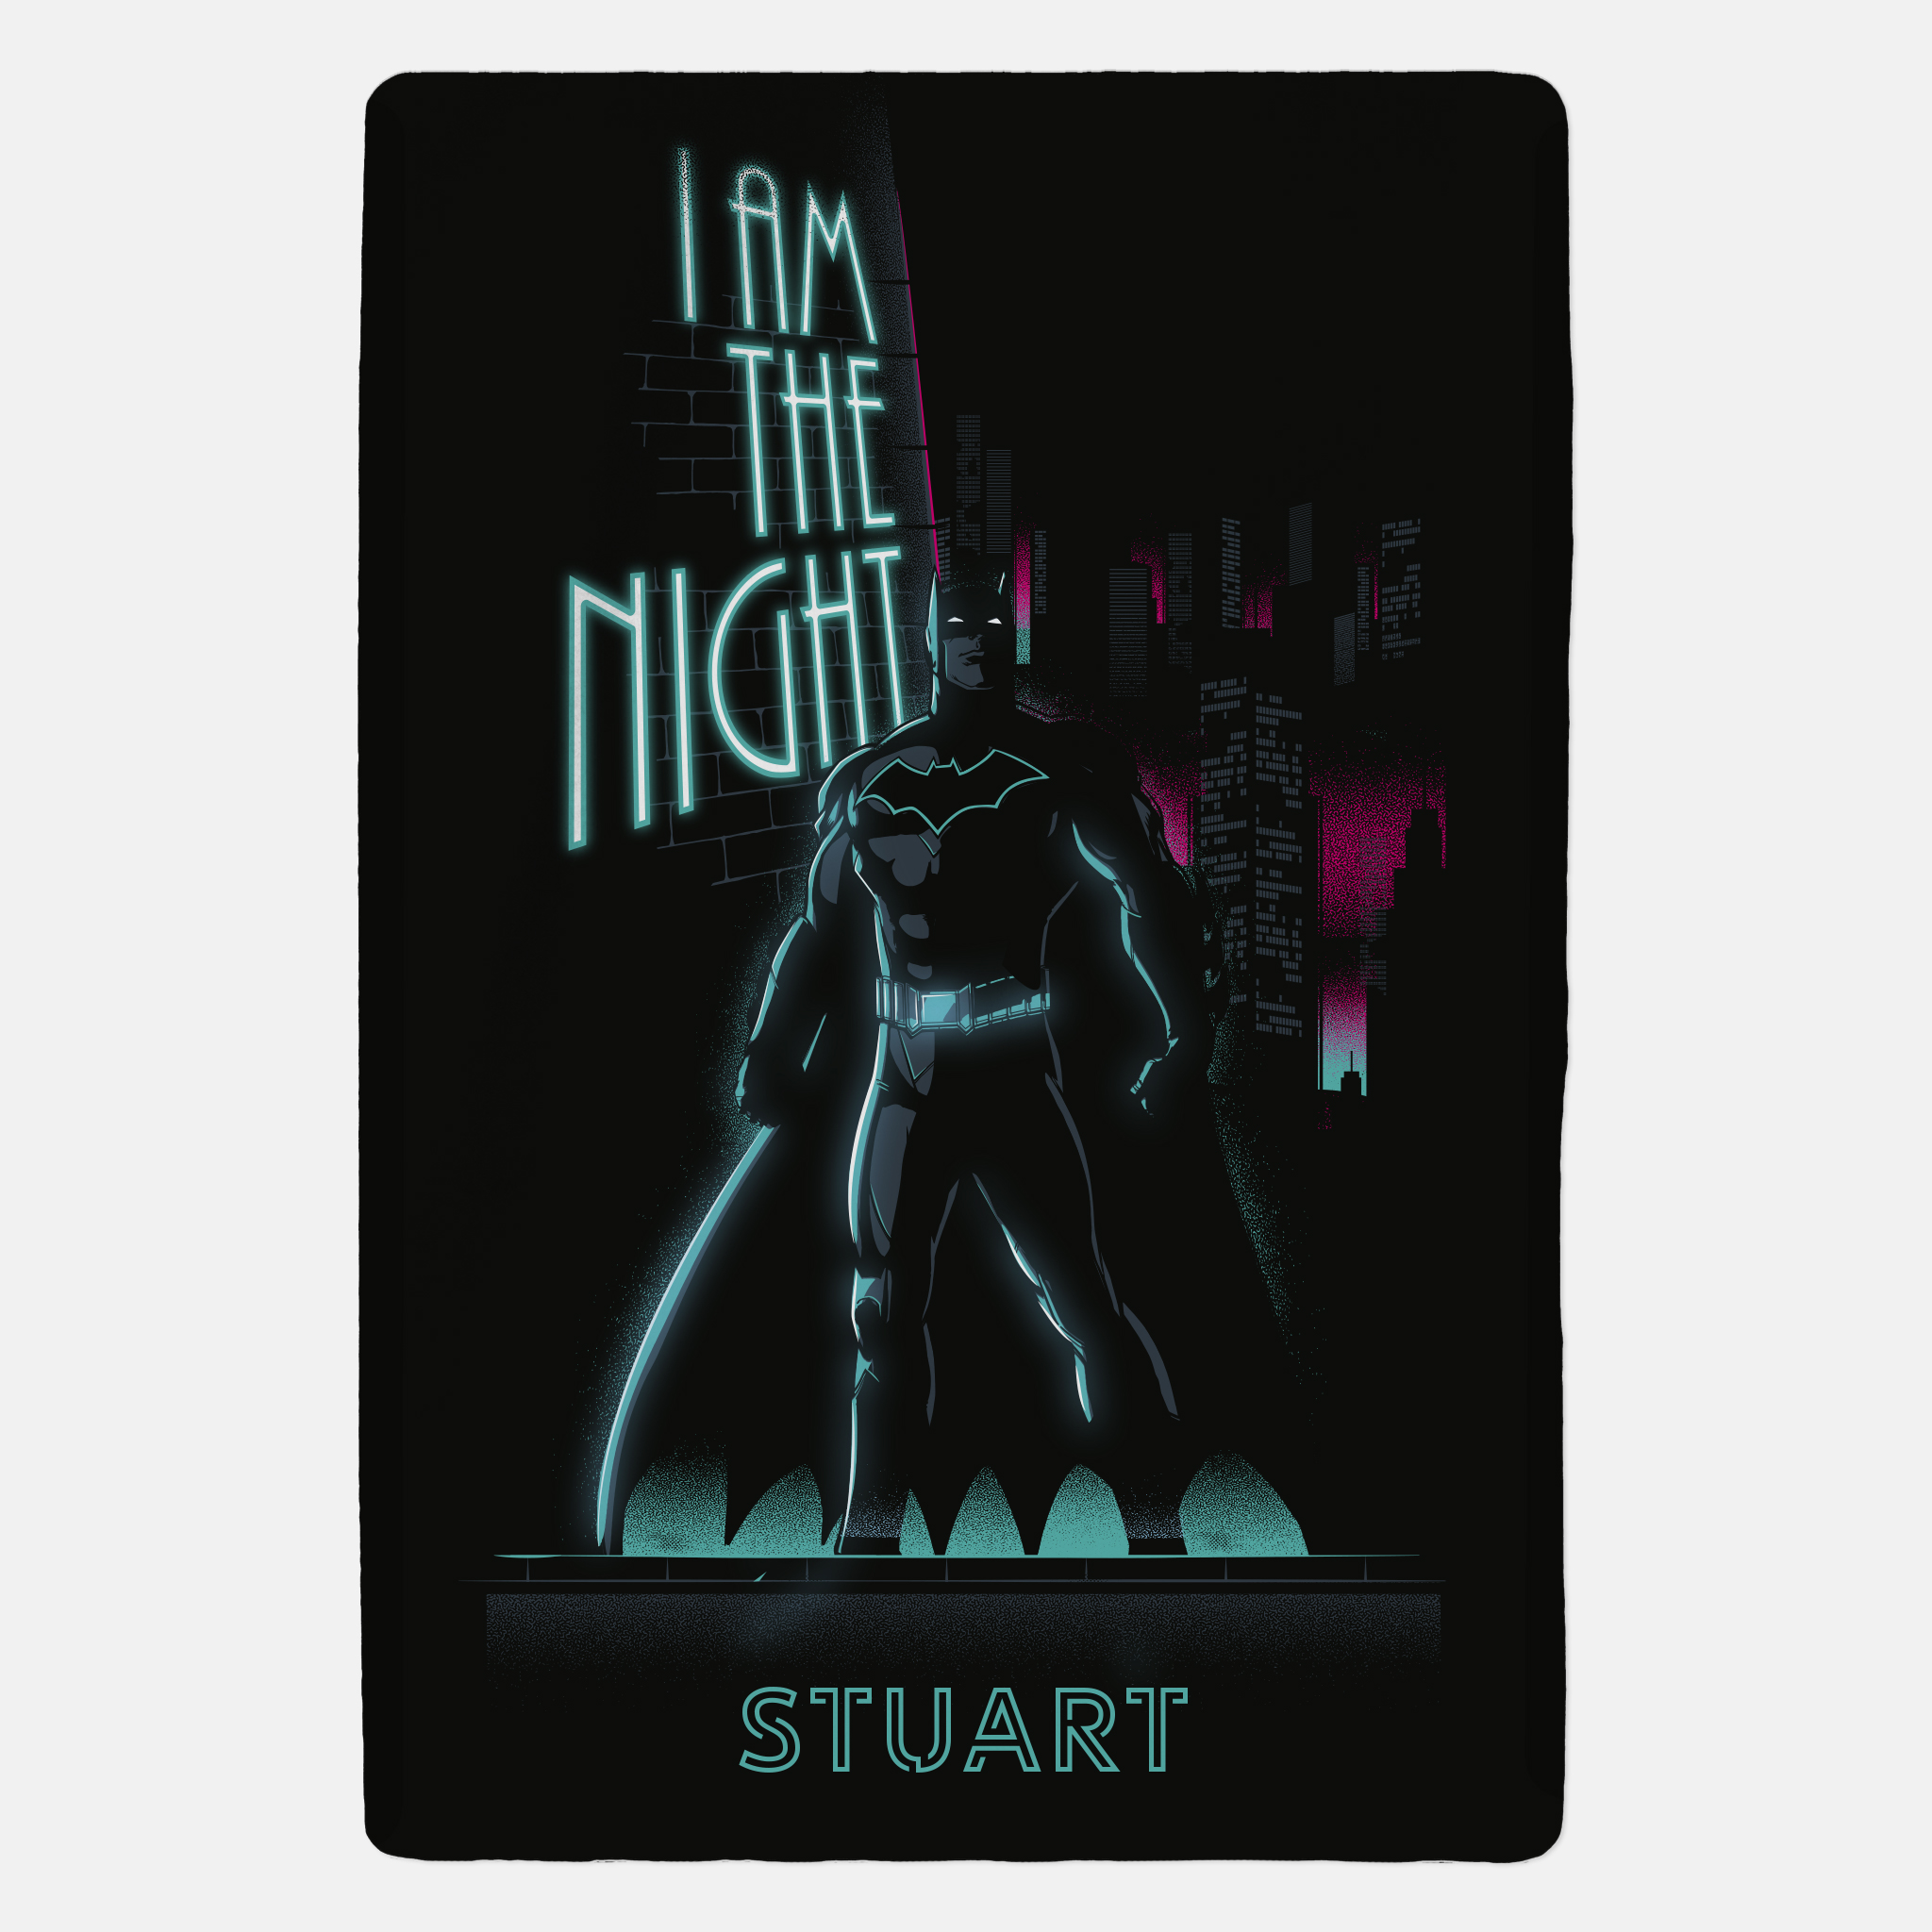 Batman™ Personalised Blanket - I Am The Night